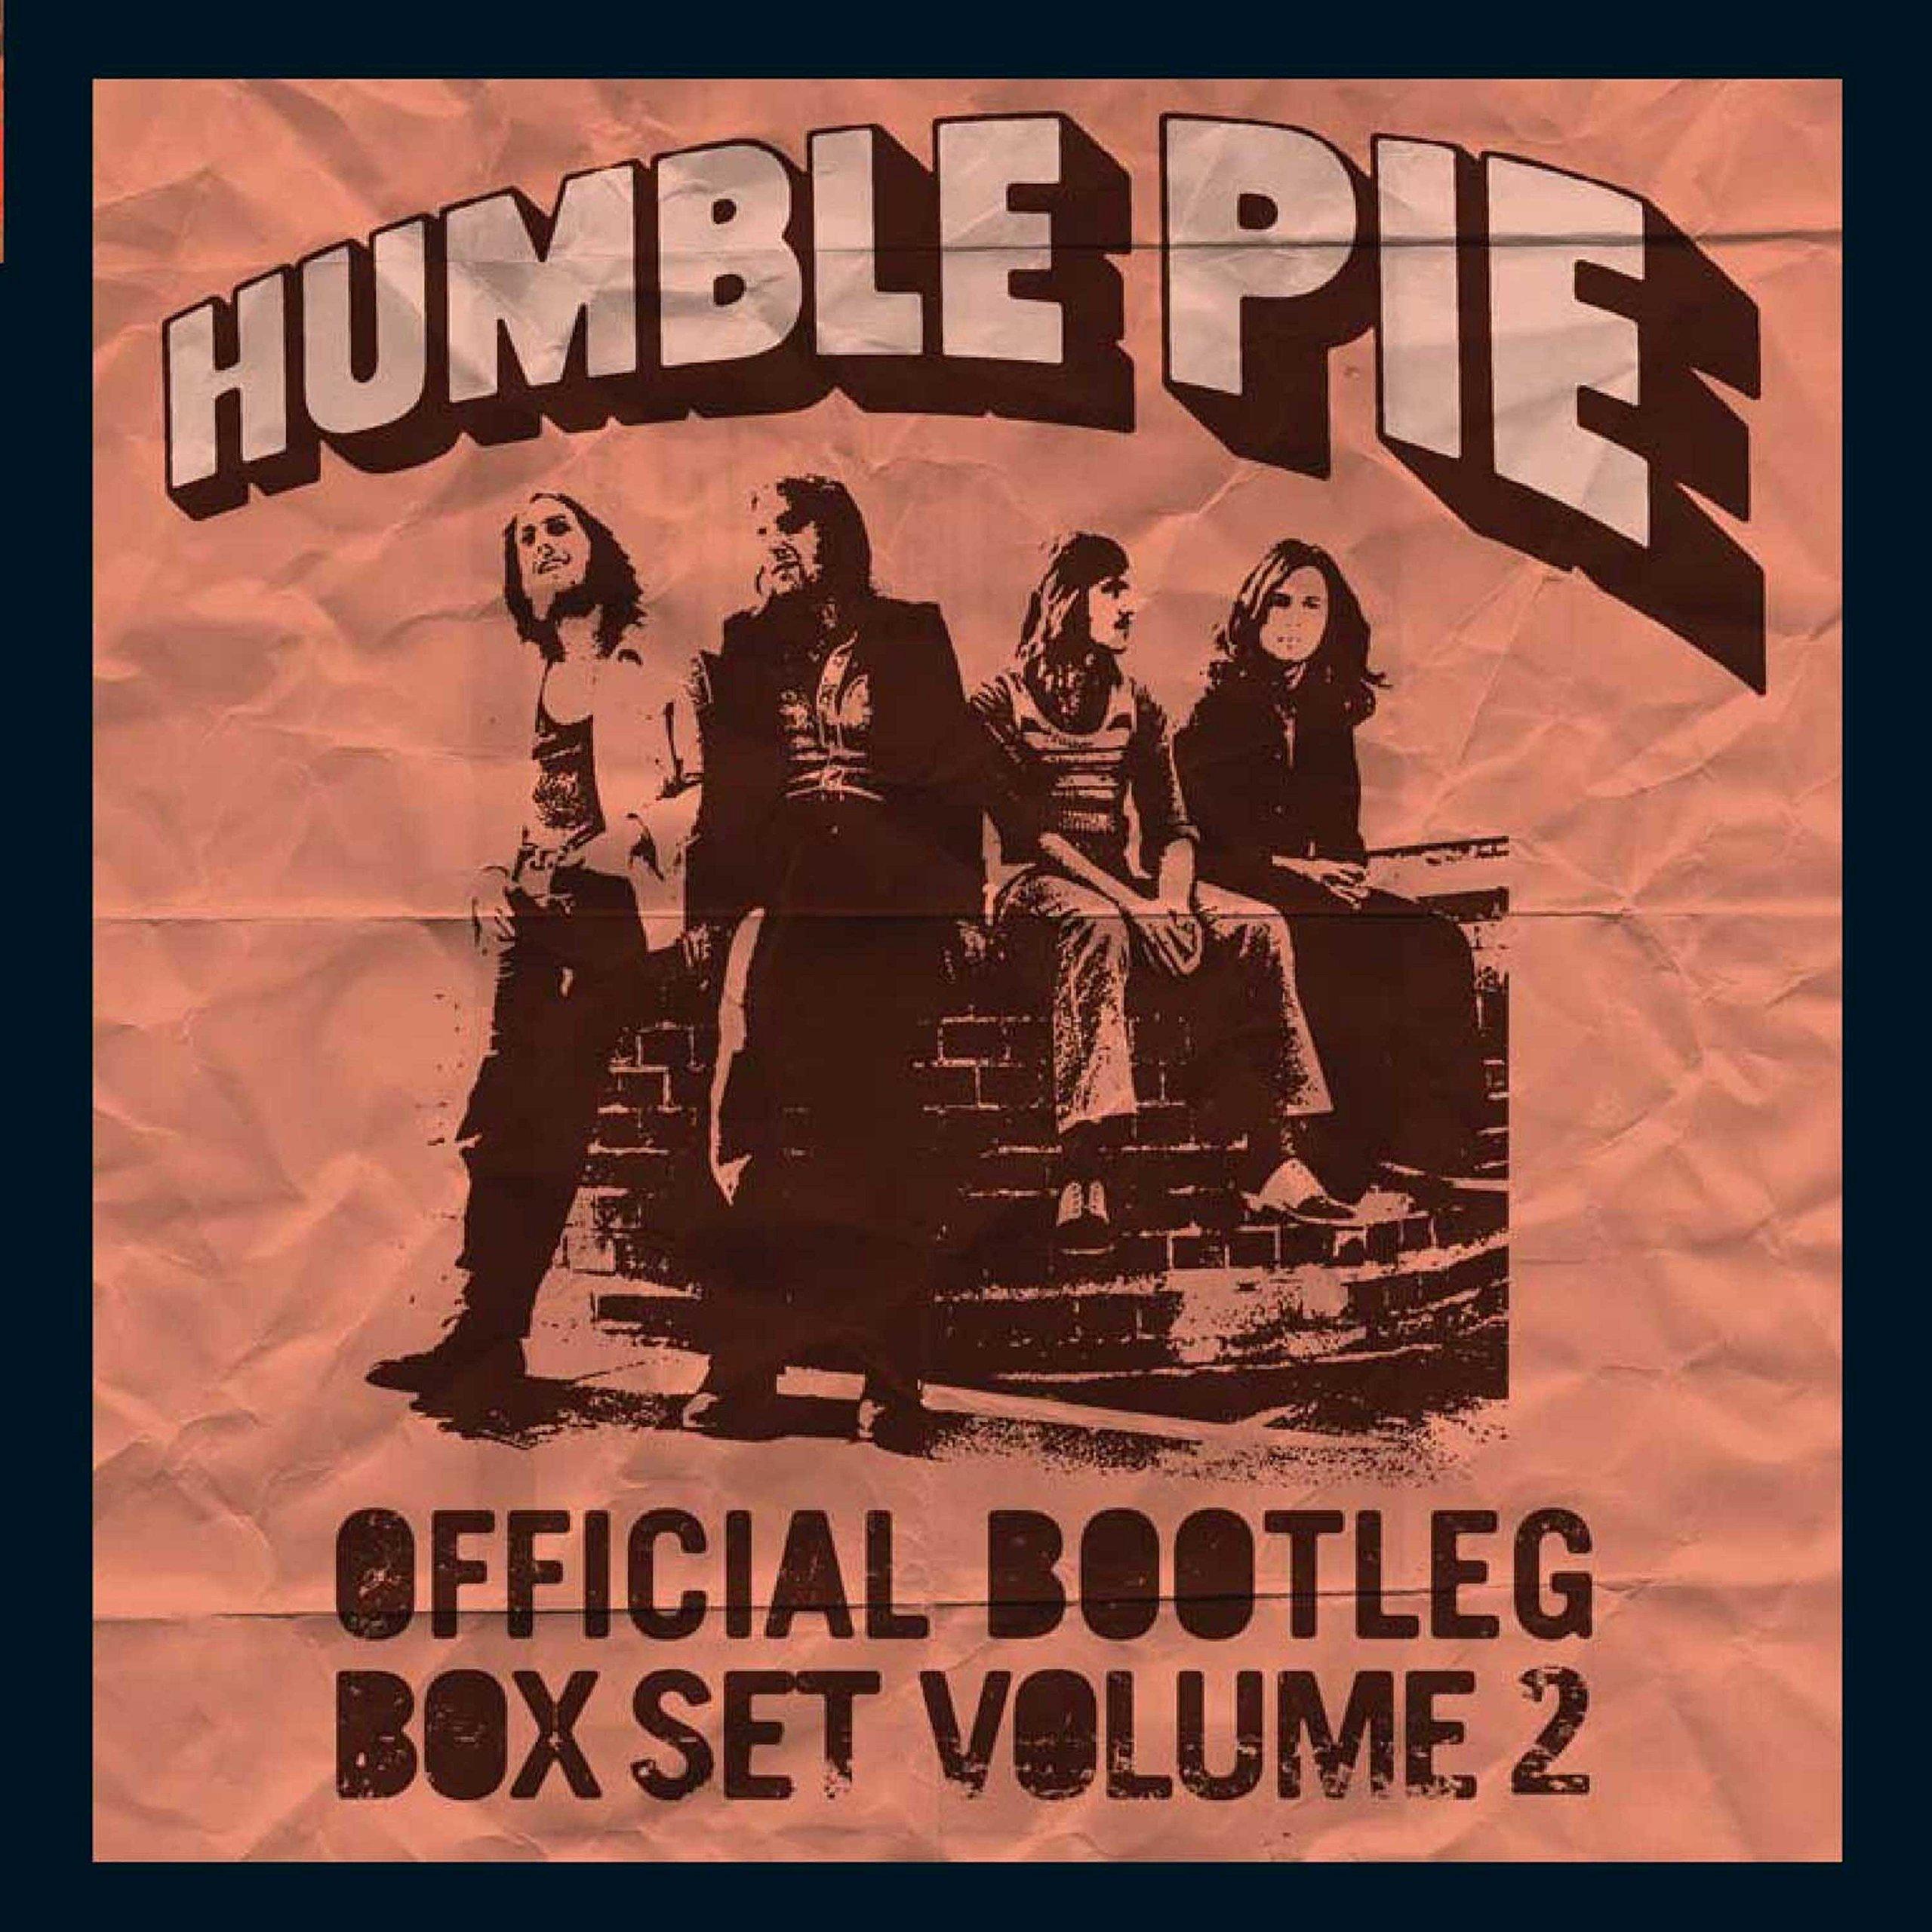 Humble Pie – Official Bootleg Box Set Volume 2 (2018) [FLAC]